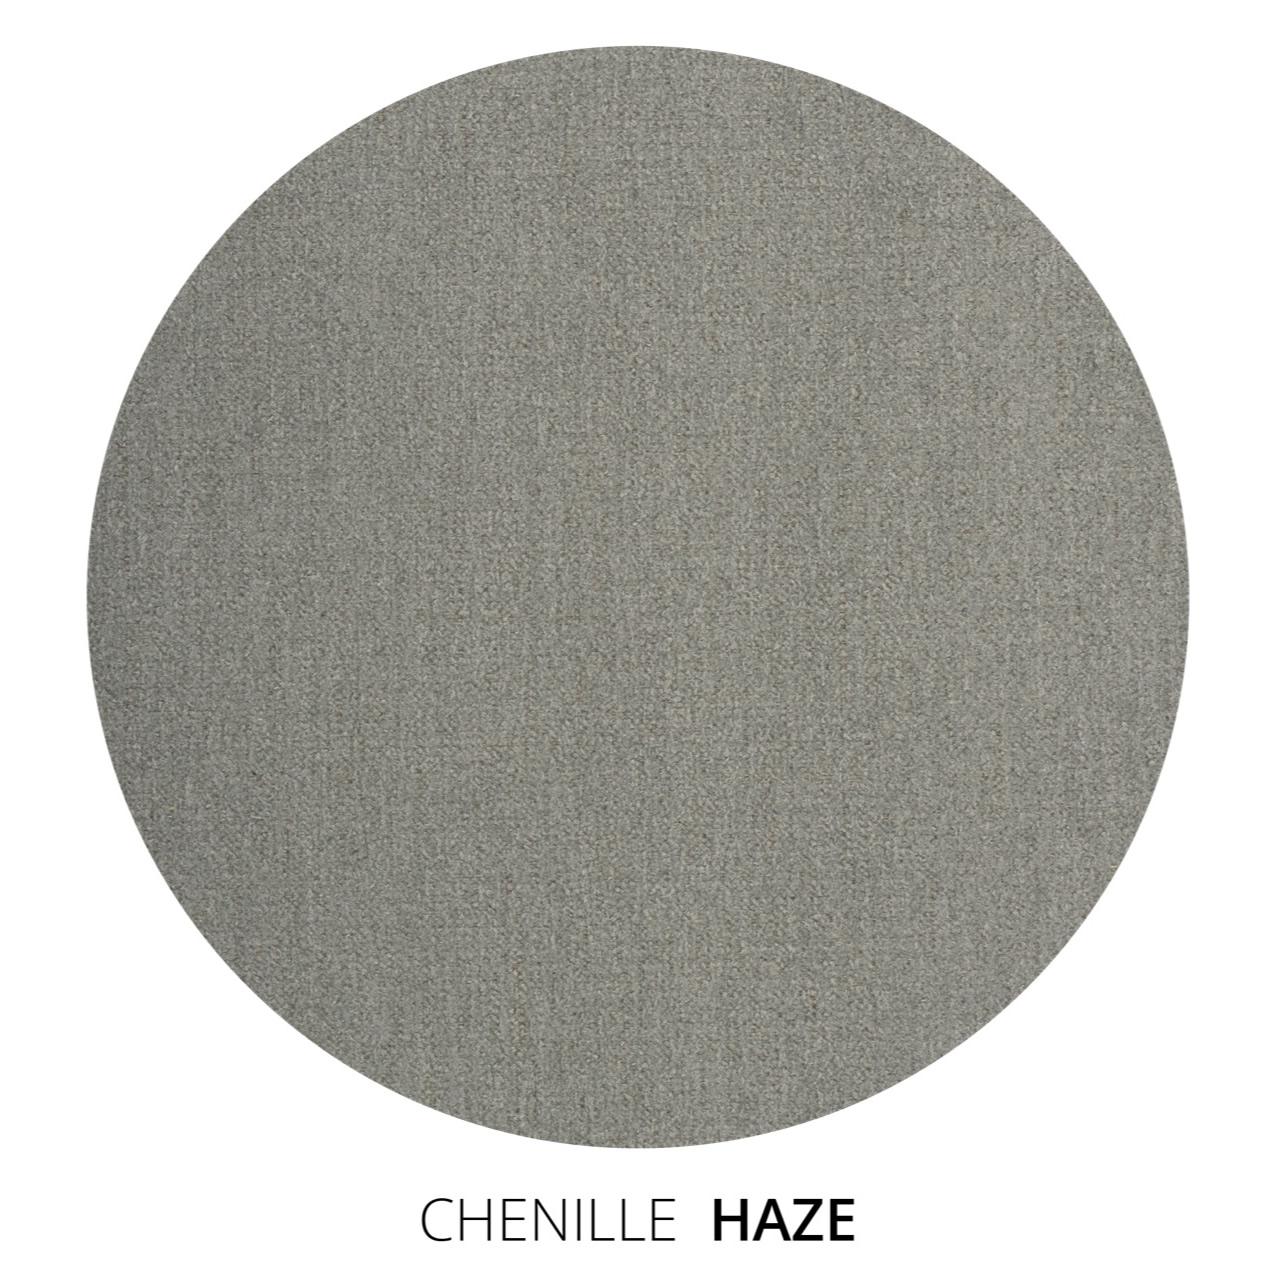 Haze Chenille Swatch